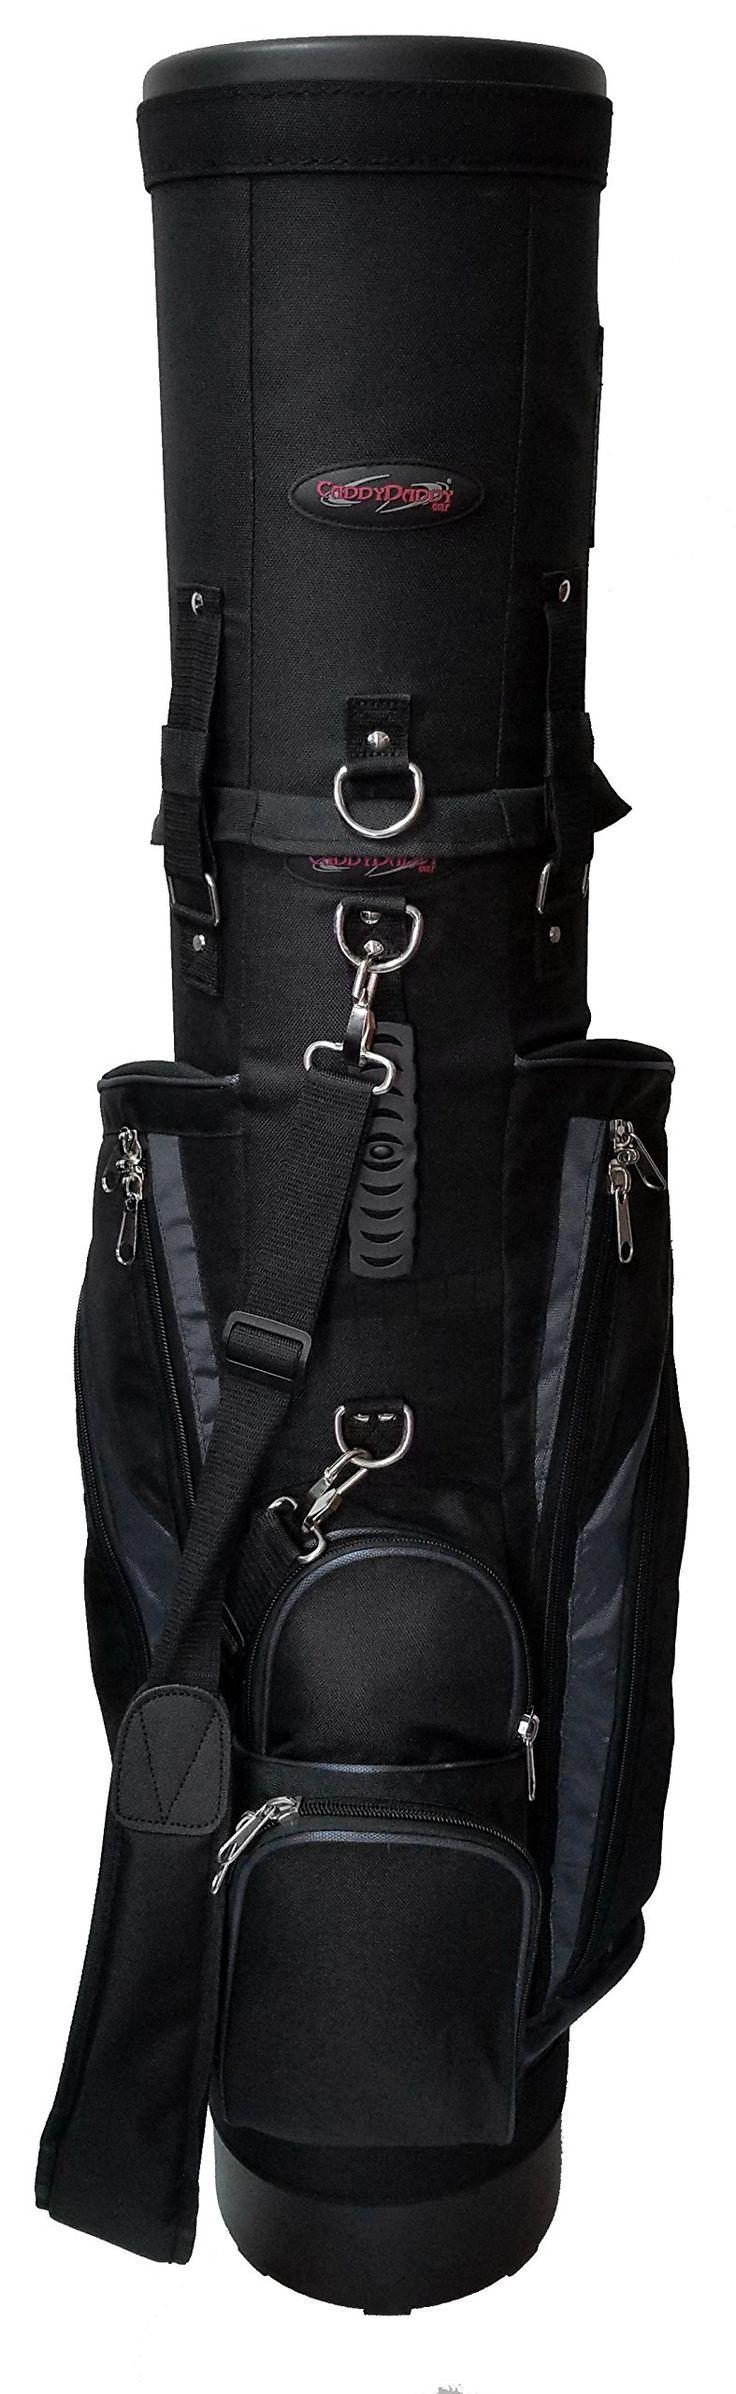 CaddyDaddy Golf Co-Pilot Pro 2 Hybrid Travel Case (Black/Grey)